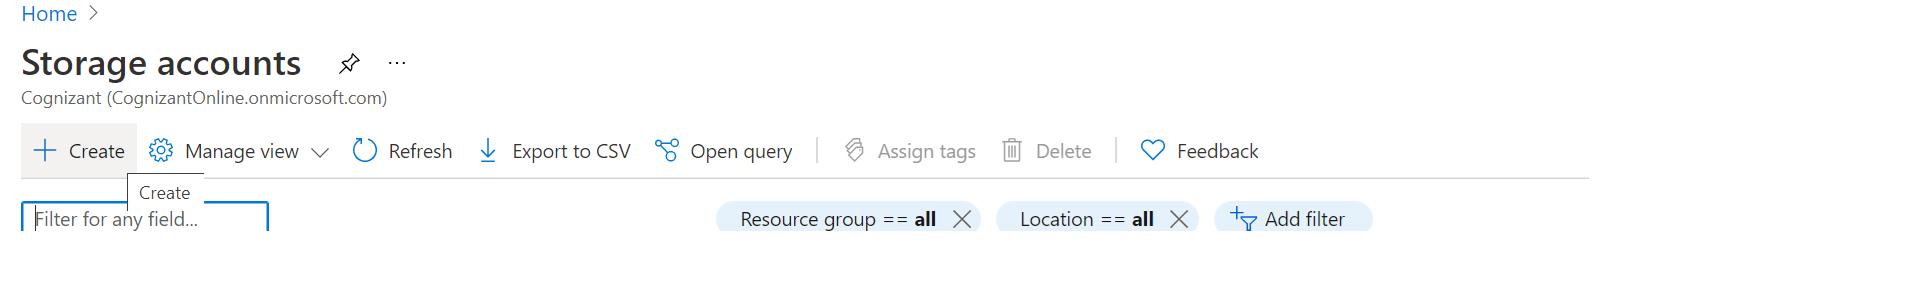 Azure Creating New Storage Accounts